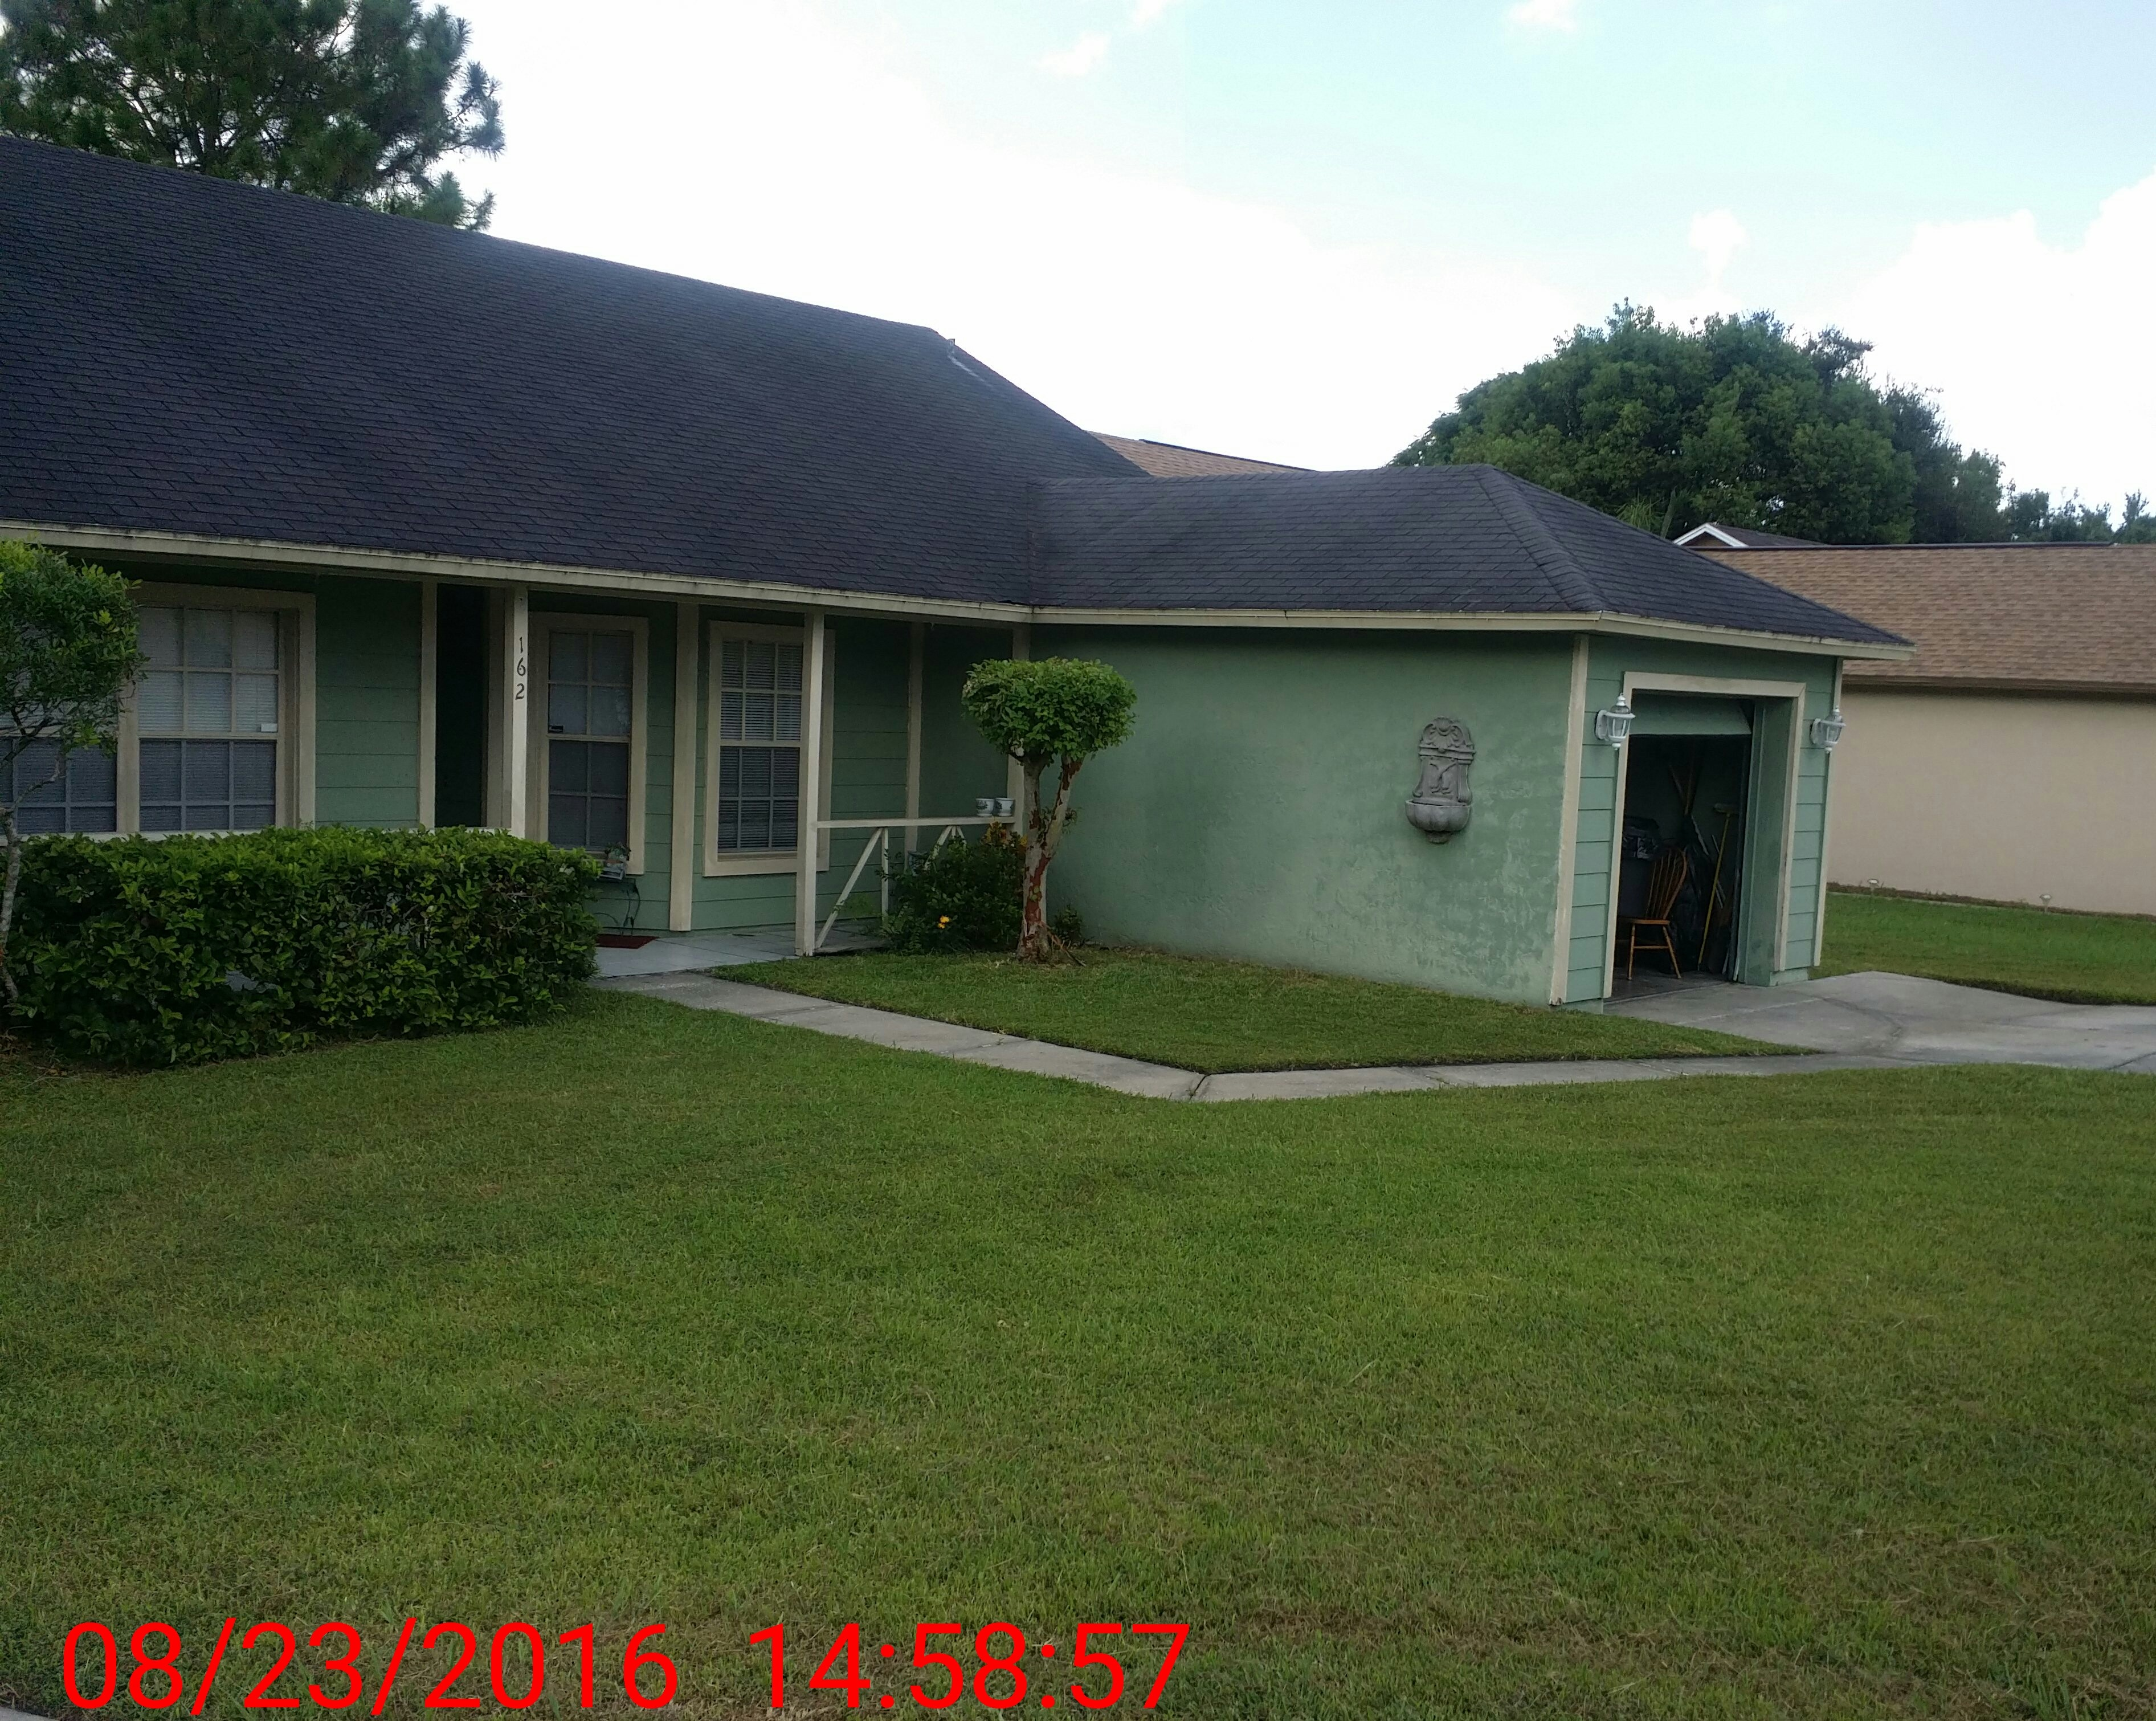 Yard mowing company in Apopka, FL, 32712